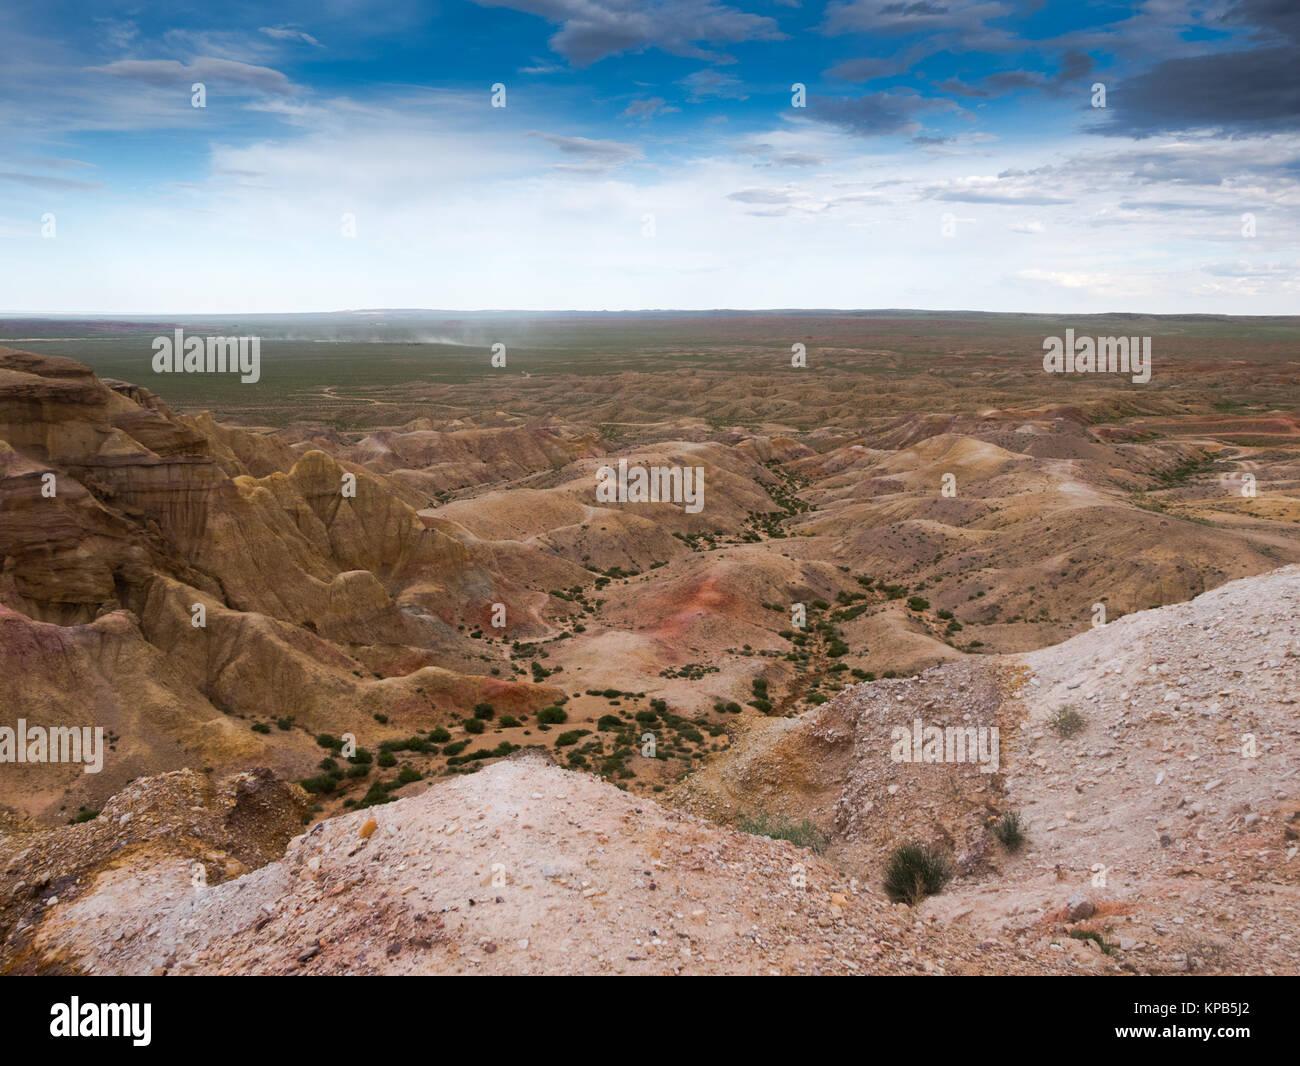 canyons in Mongolia, tsagaan suvraga. Bright landscape - Stock Image